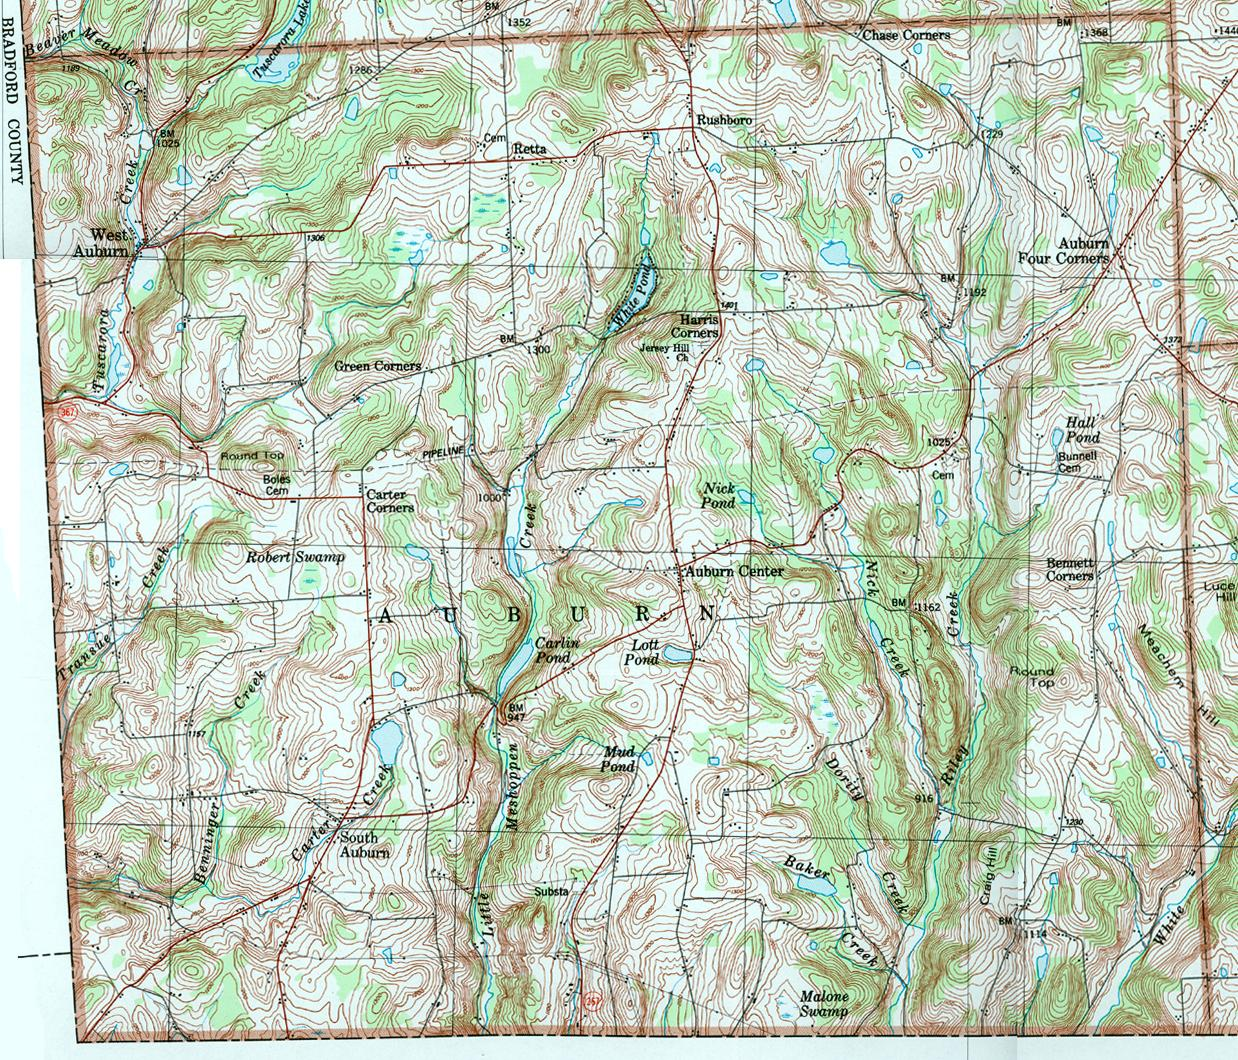 Susquehanna County Pennsylvania Township Maps - Map of four corners area usa